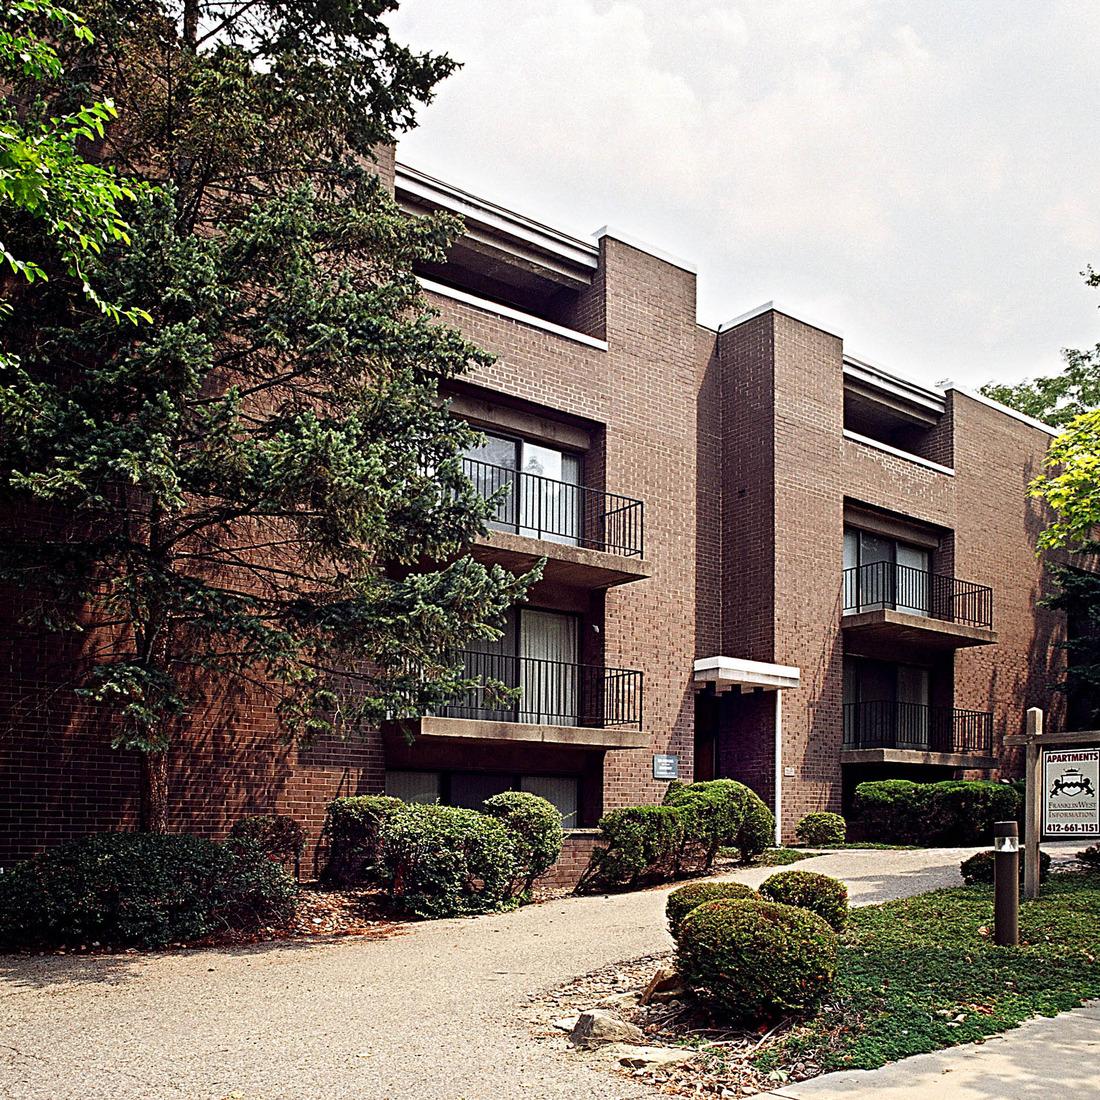 509 S. Highland Avenue